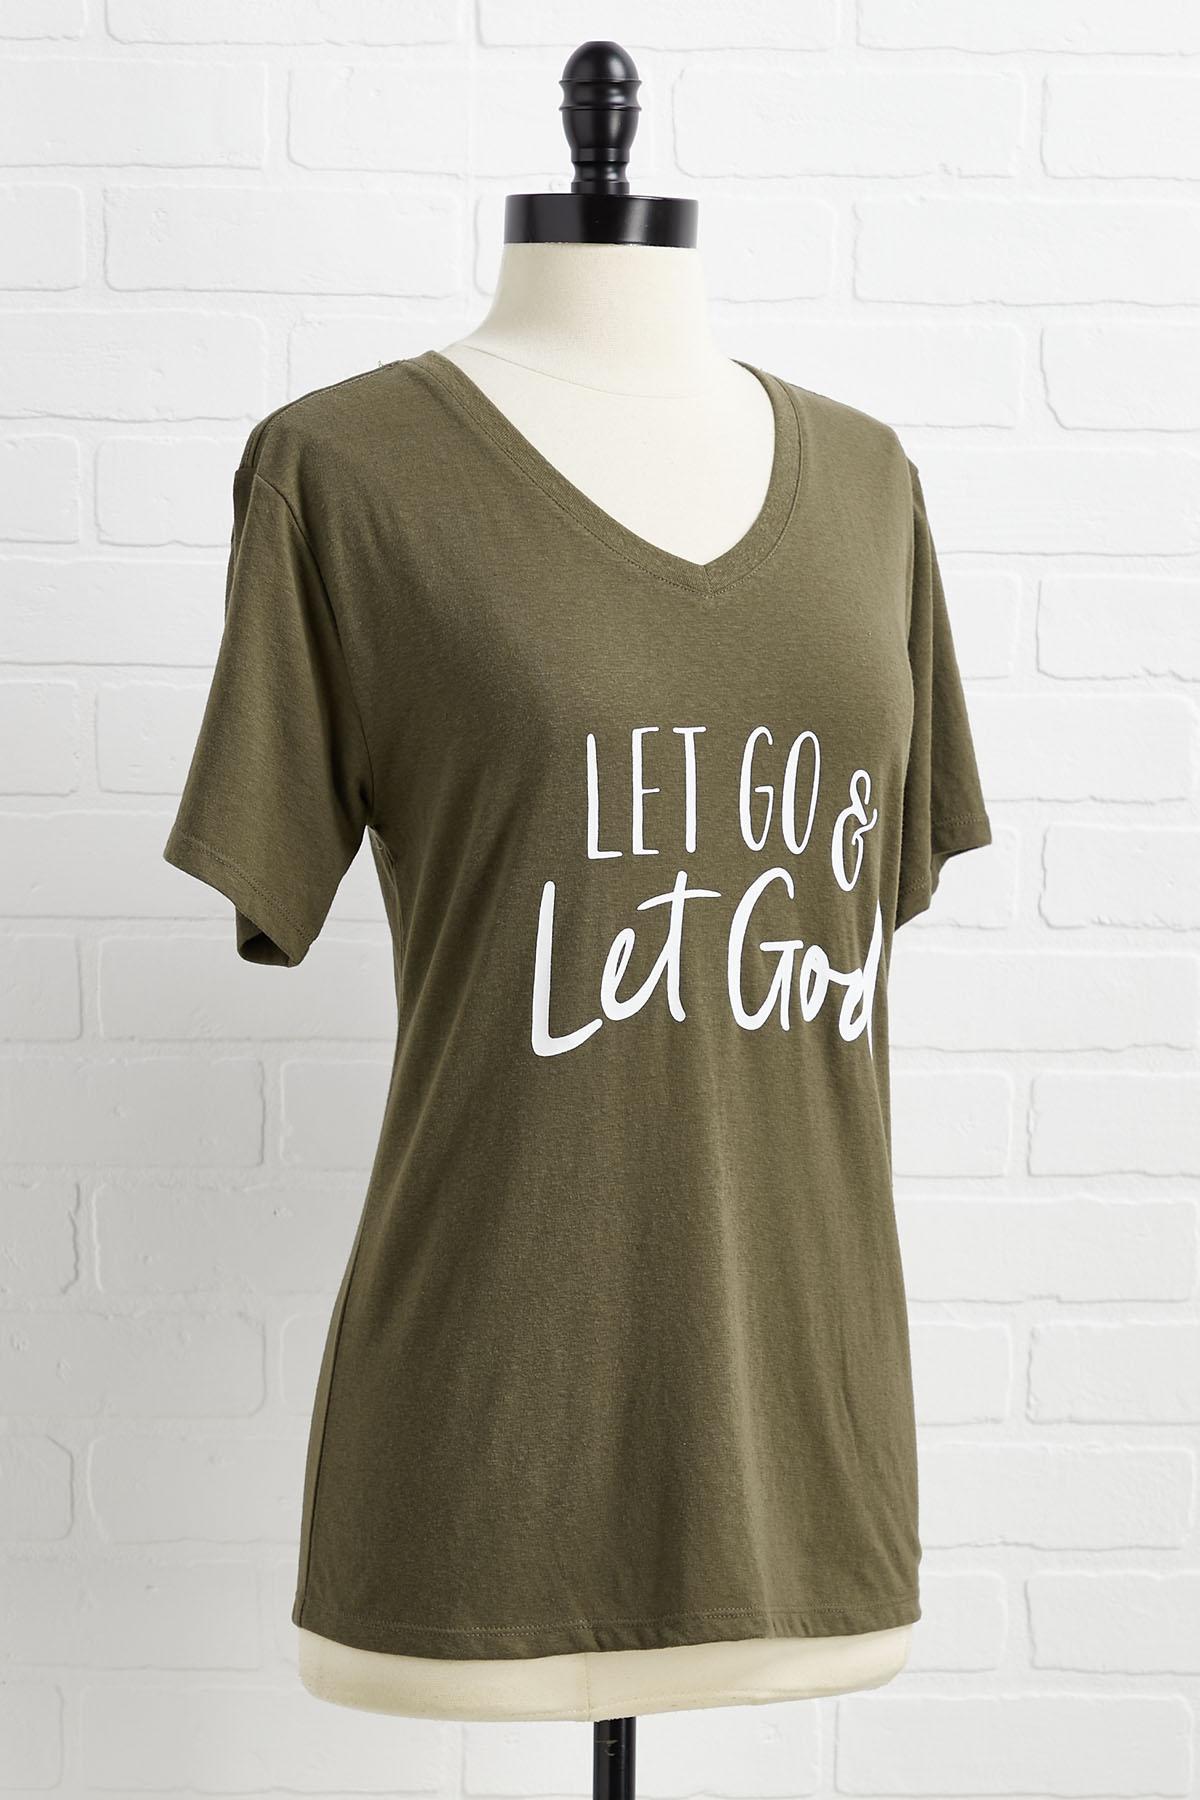 Let God Tee